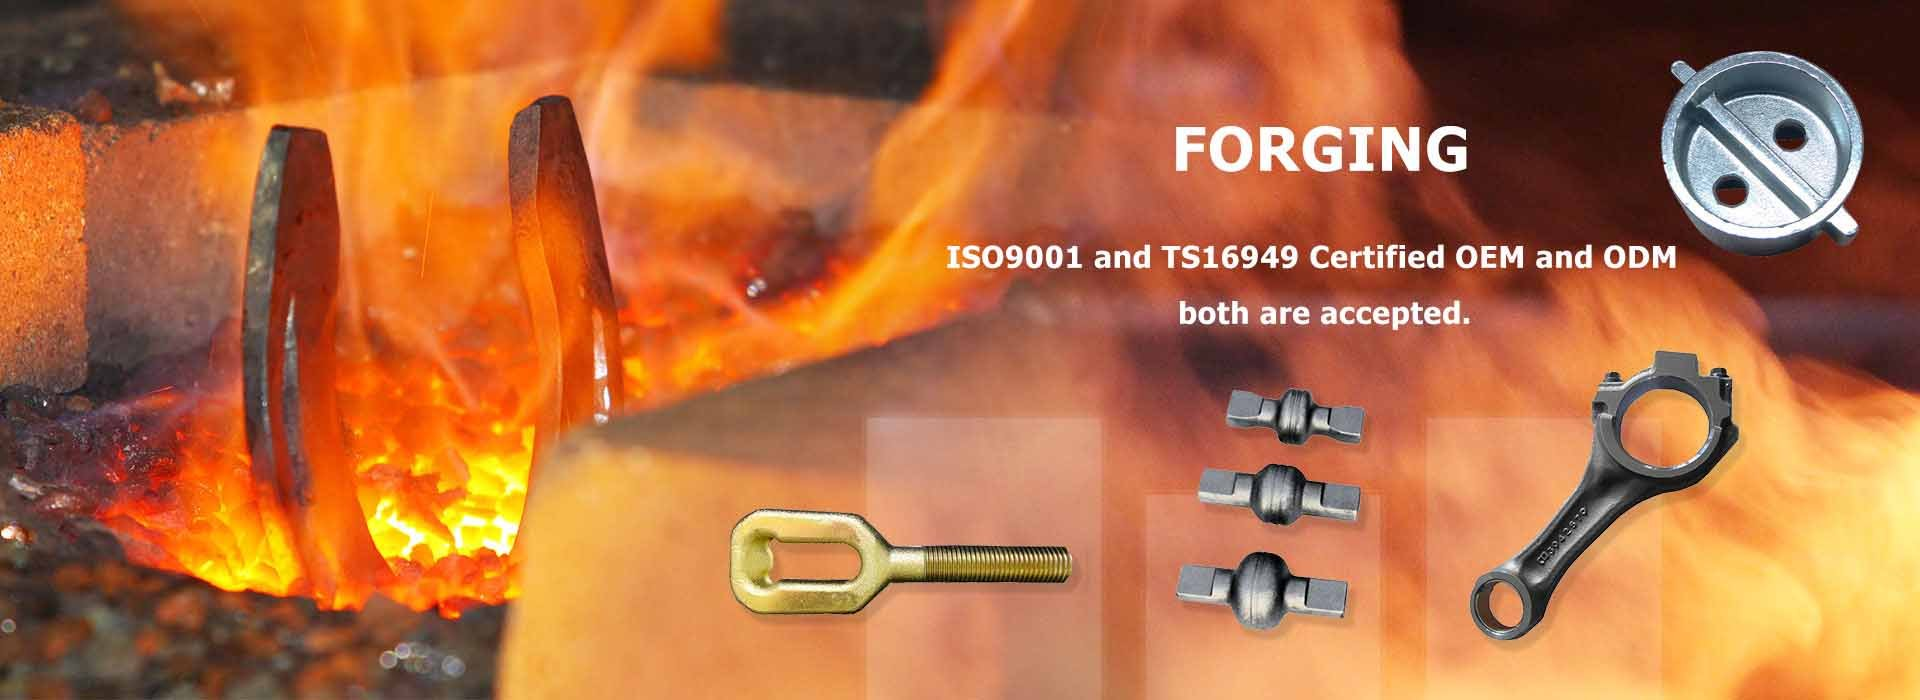 forging-03-21Jun-19